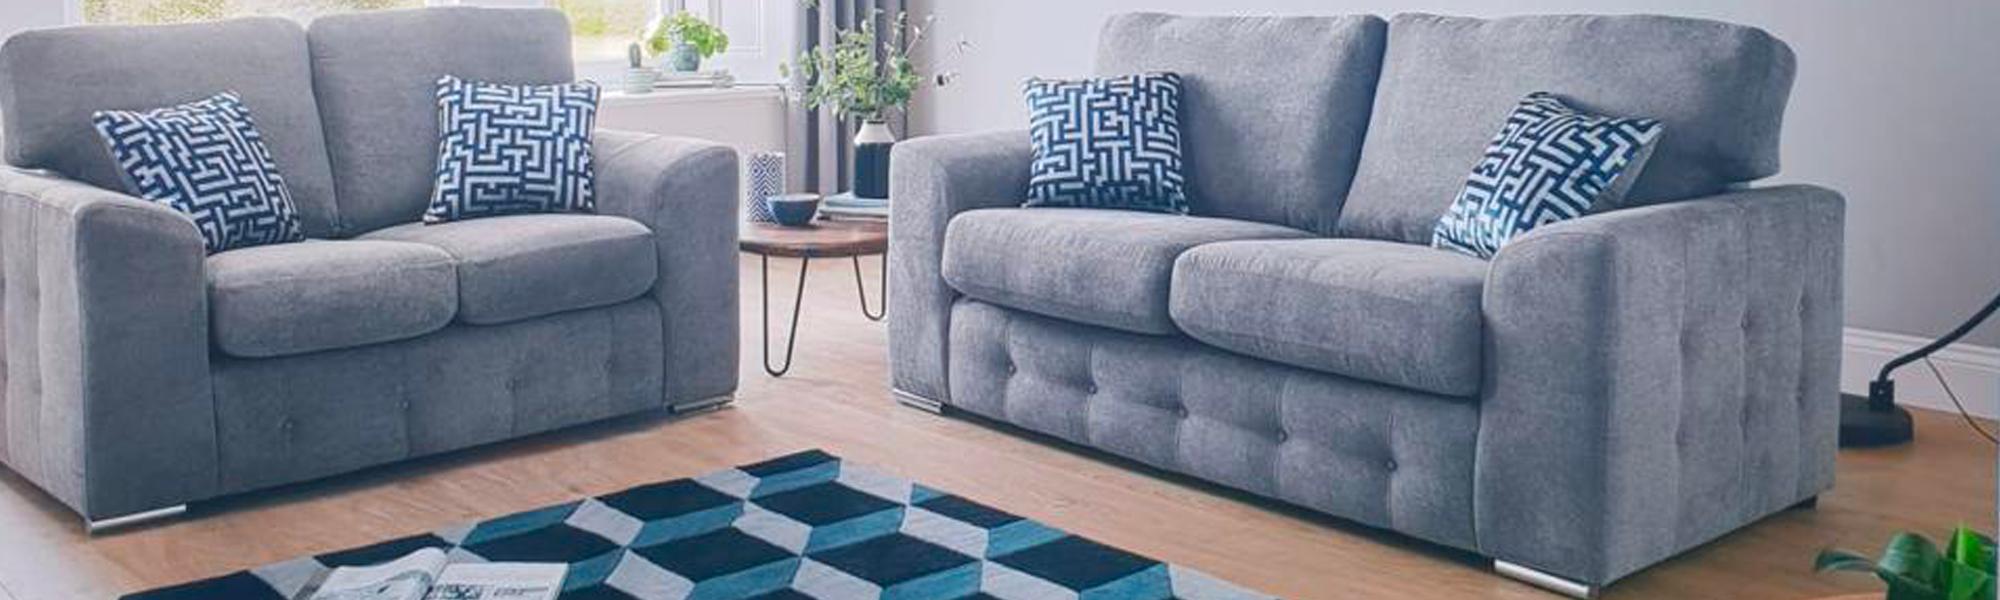 Fabric 3 Seater Sofas